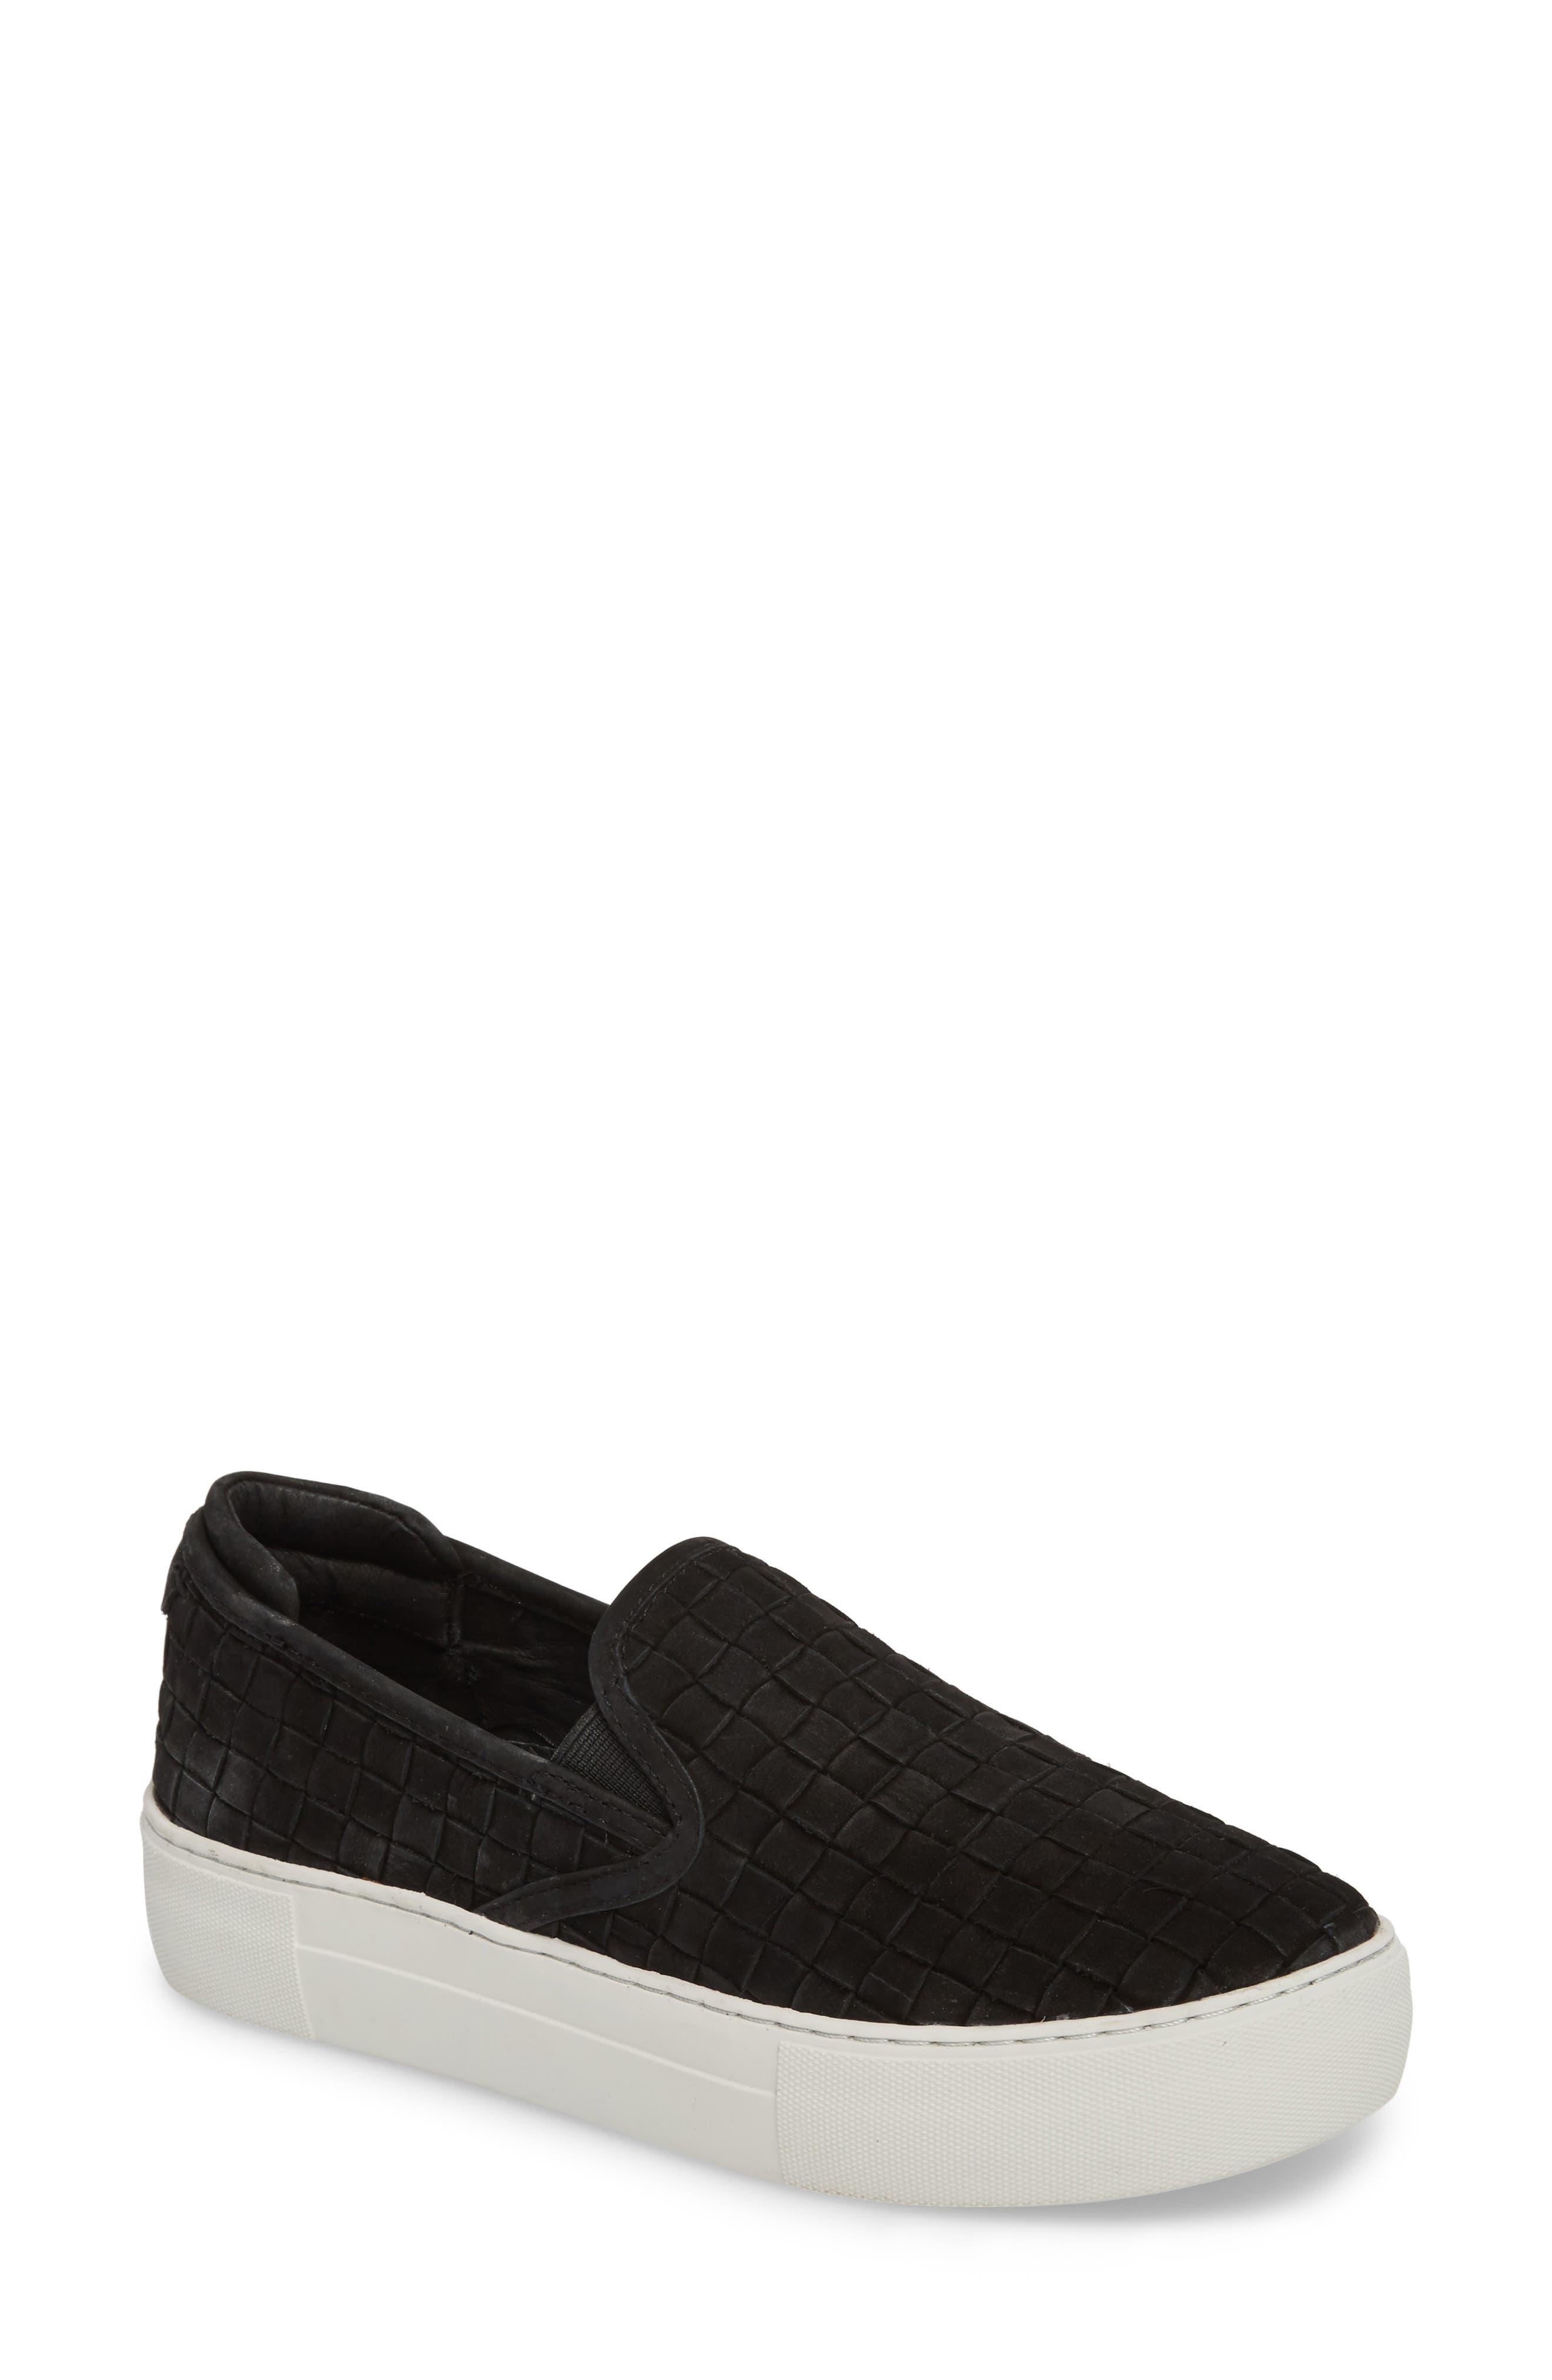 Proper Slip-On Sneaker,                             Main thumbnail 1, color,                             BLACK NUBUCK